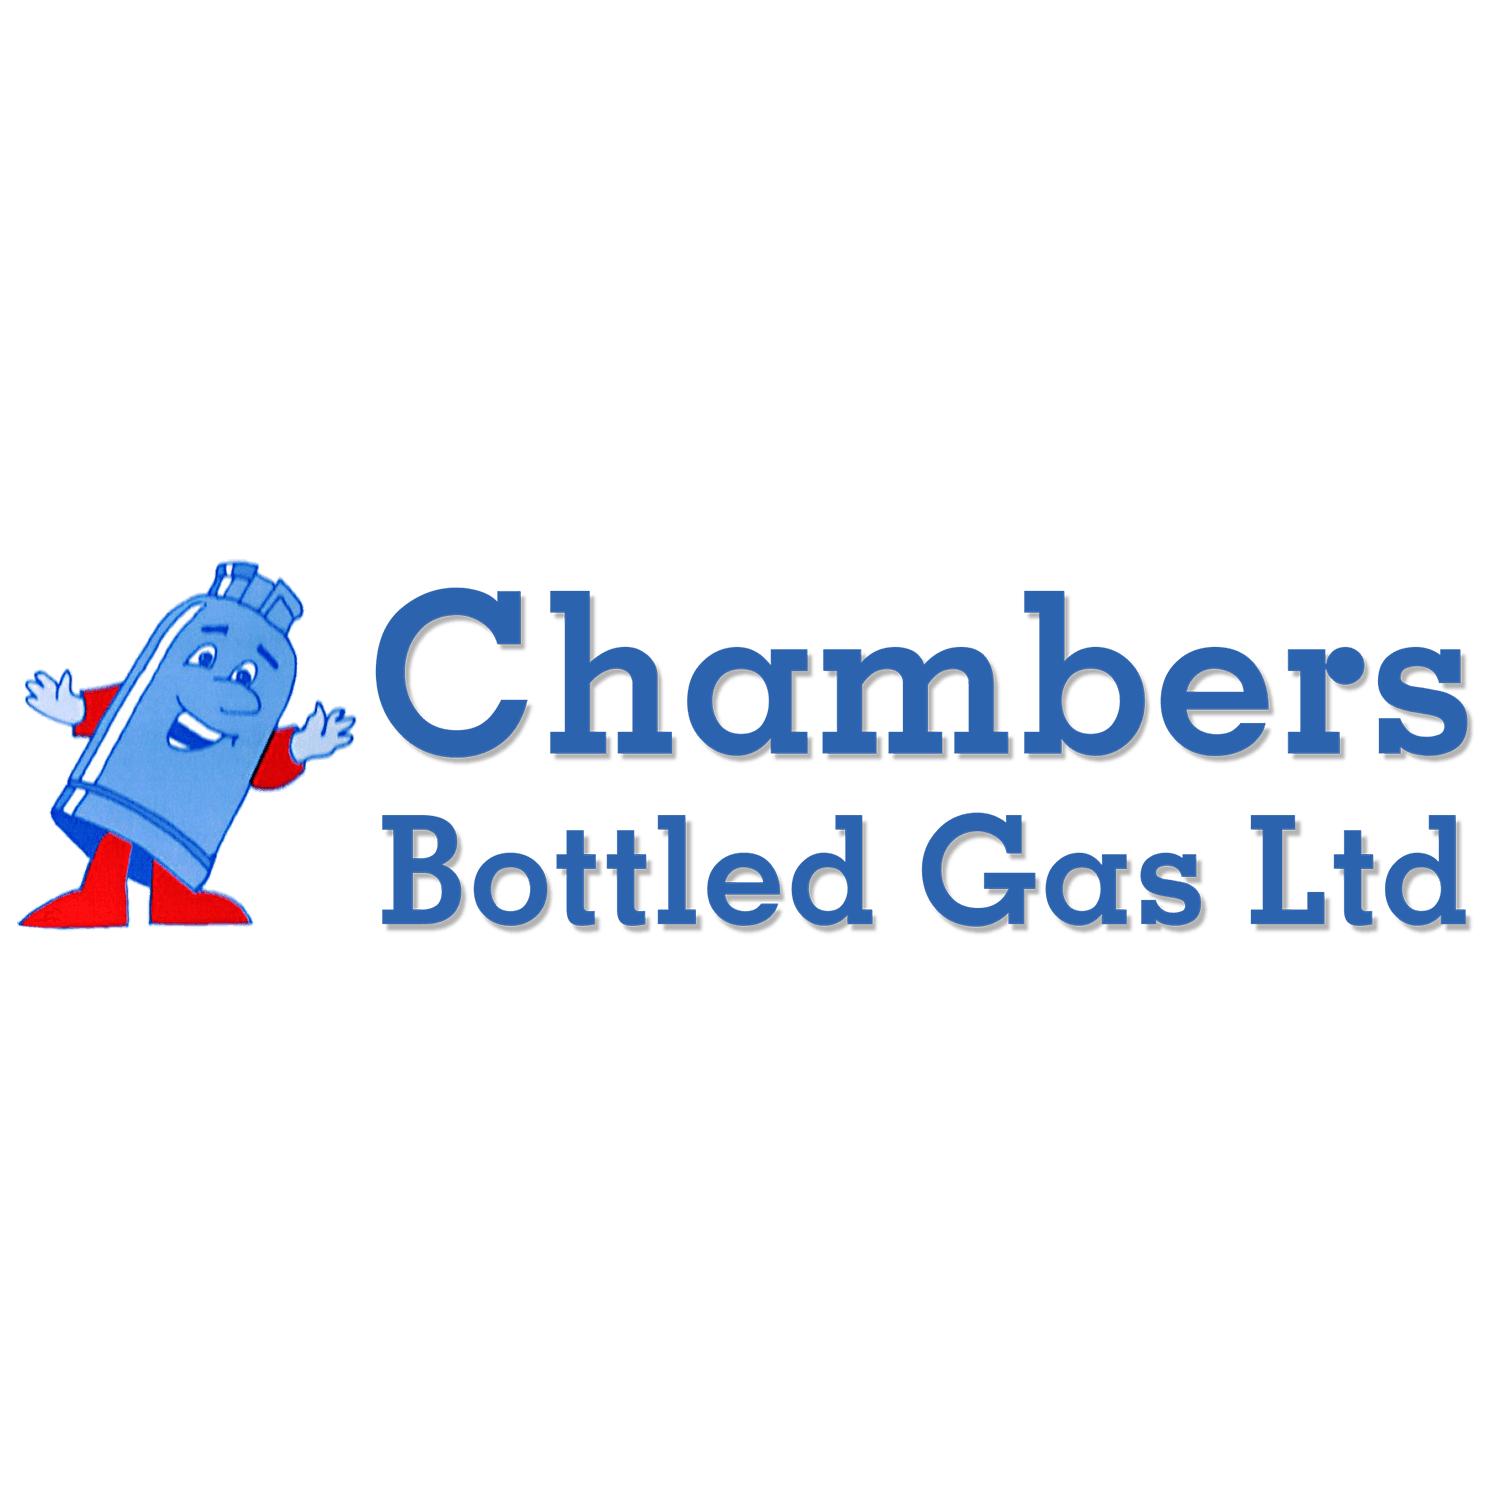 Chambers Bottled Gas Ltd